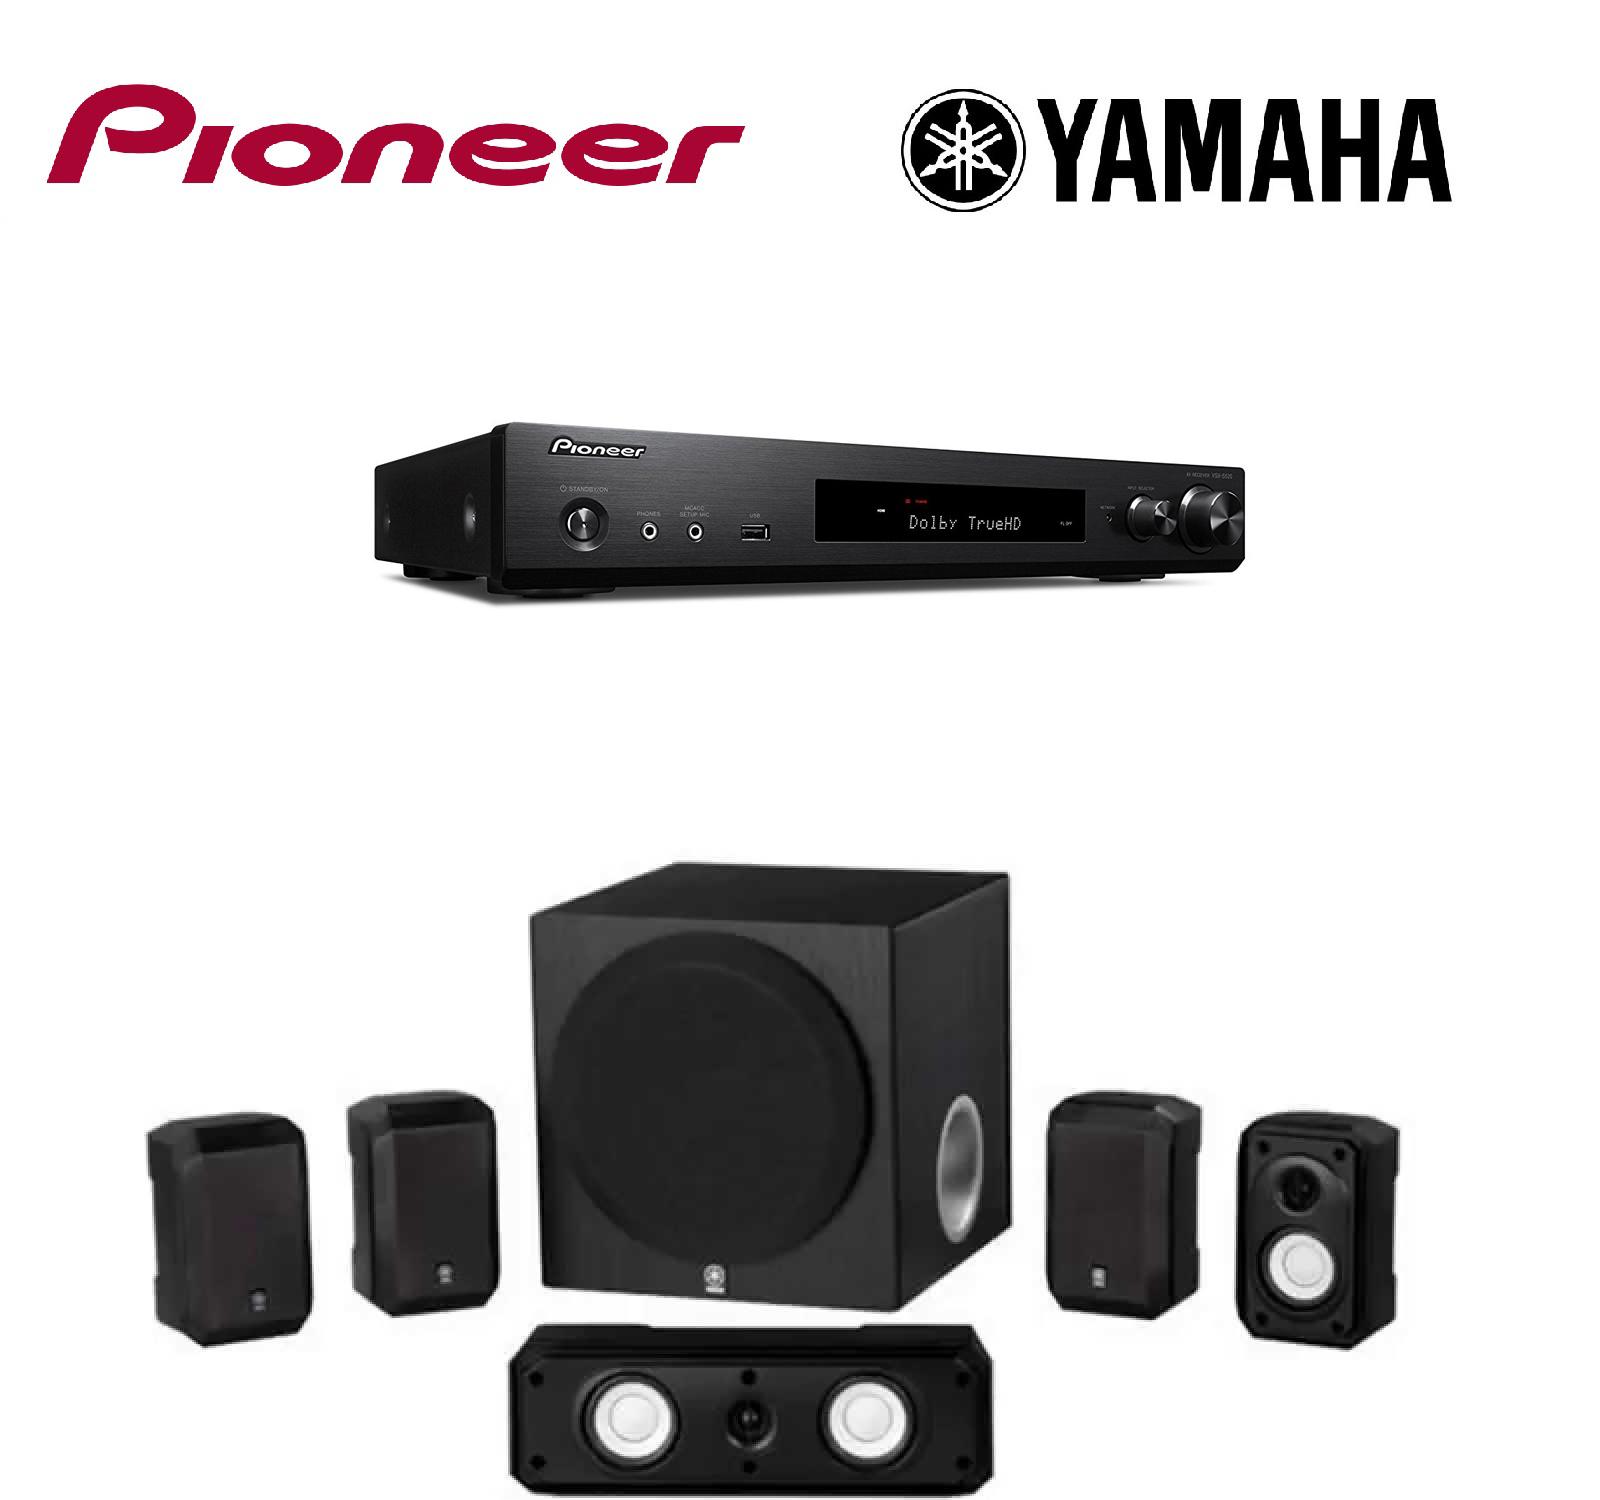 Pioneer Slim Audio ; Video Component Receiver,Black (VSX-S520) + Yamaha NS-SP1800BL 5.1-Channel Home Theater Speaker Set Bundle